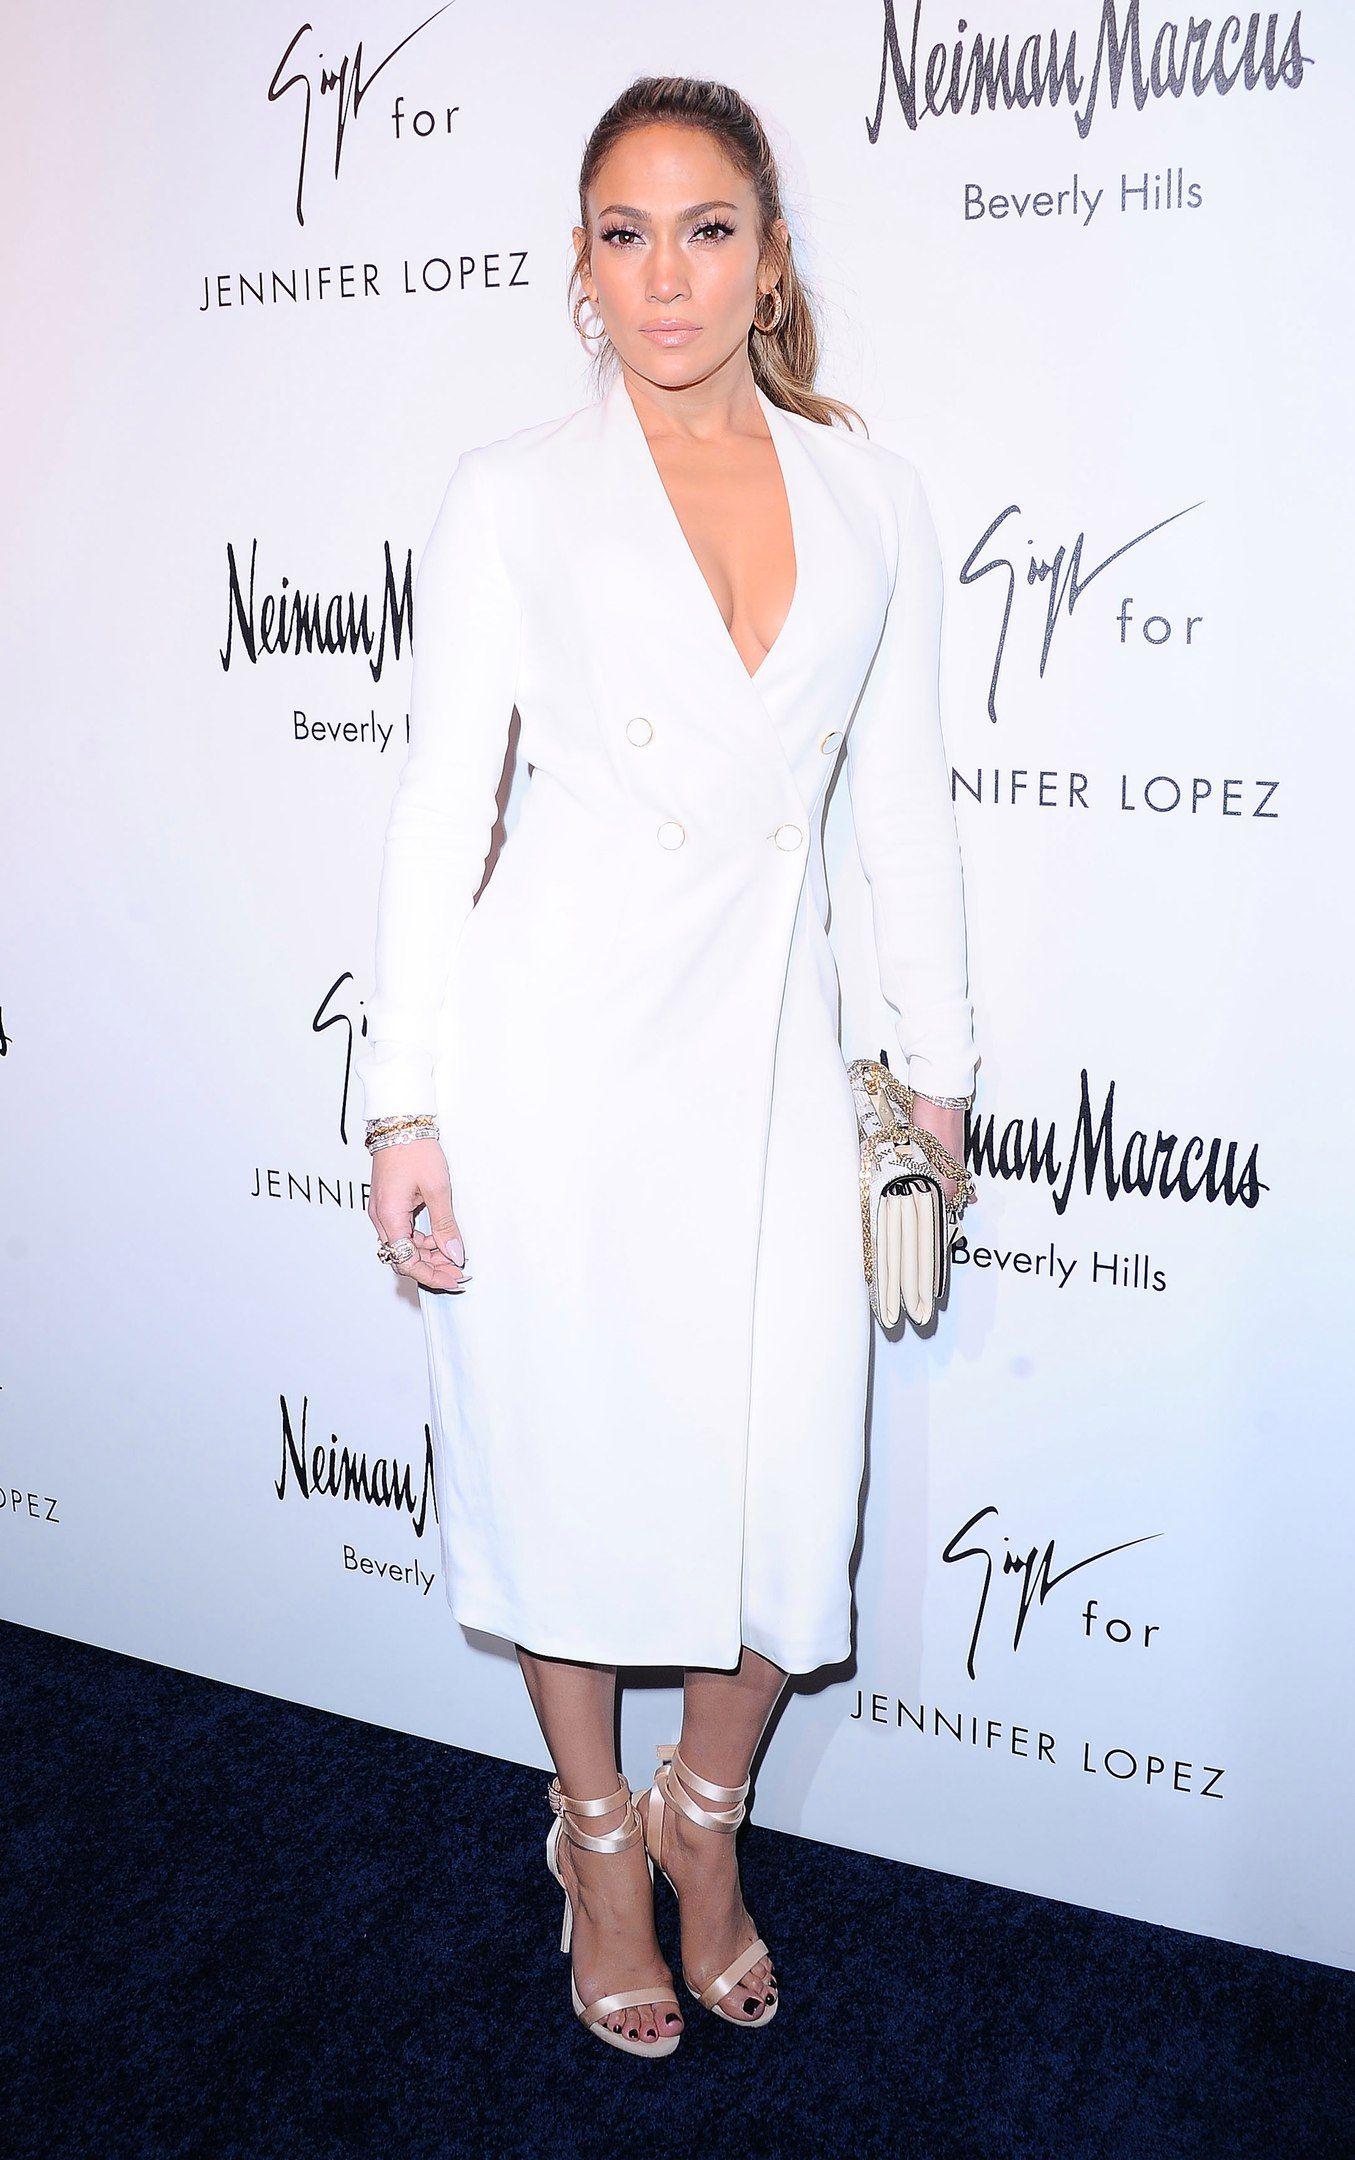 Pics Pop Singer Jennifer Lopez Naked Leaked Photos -2685